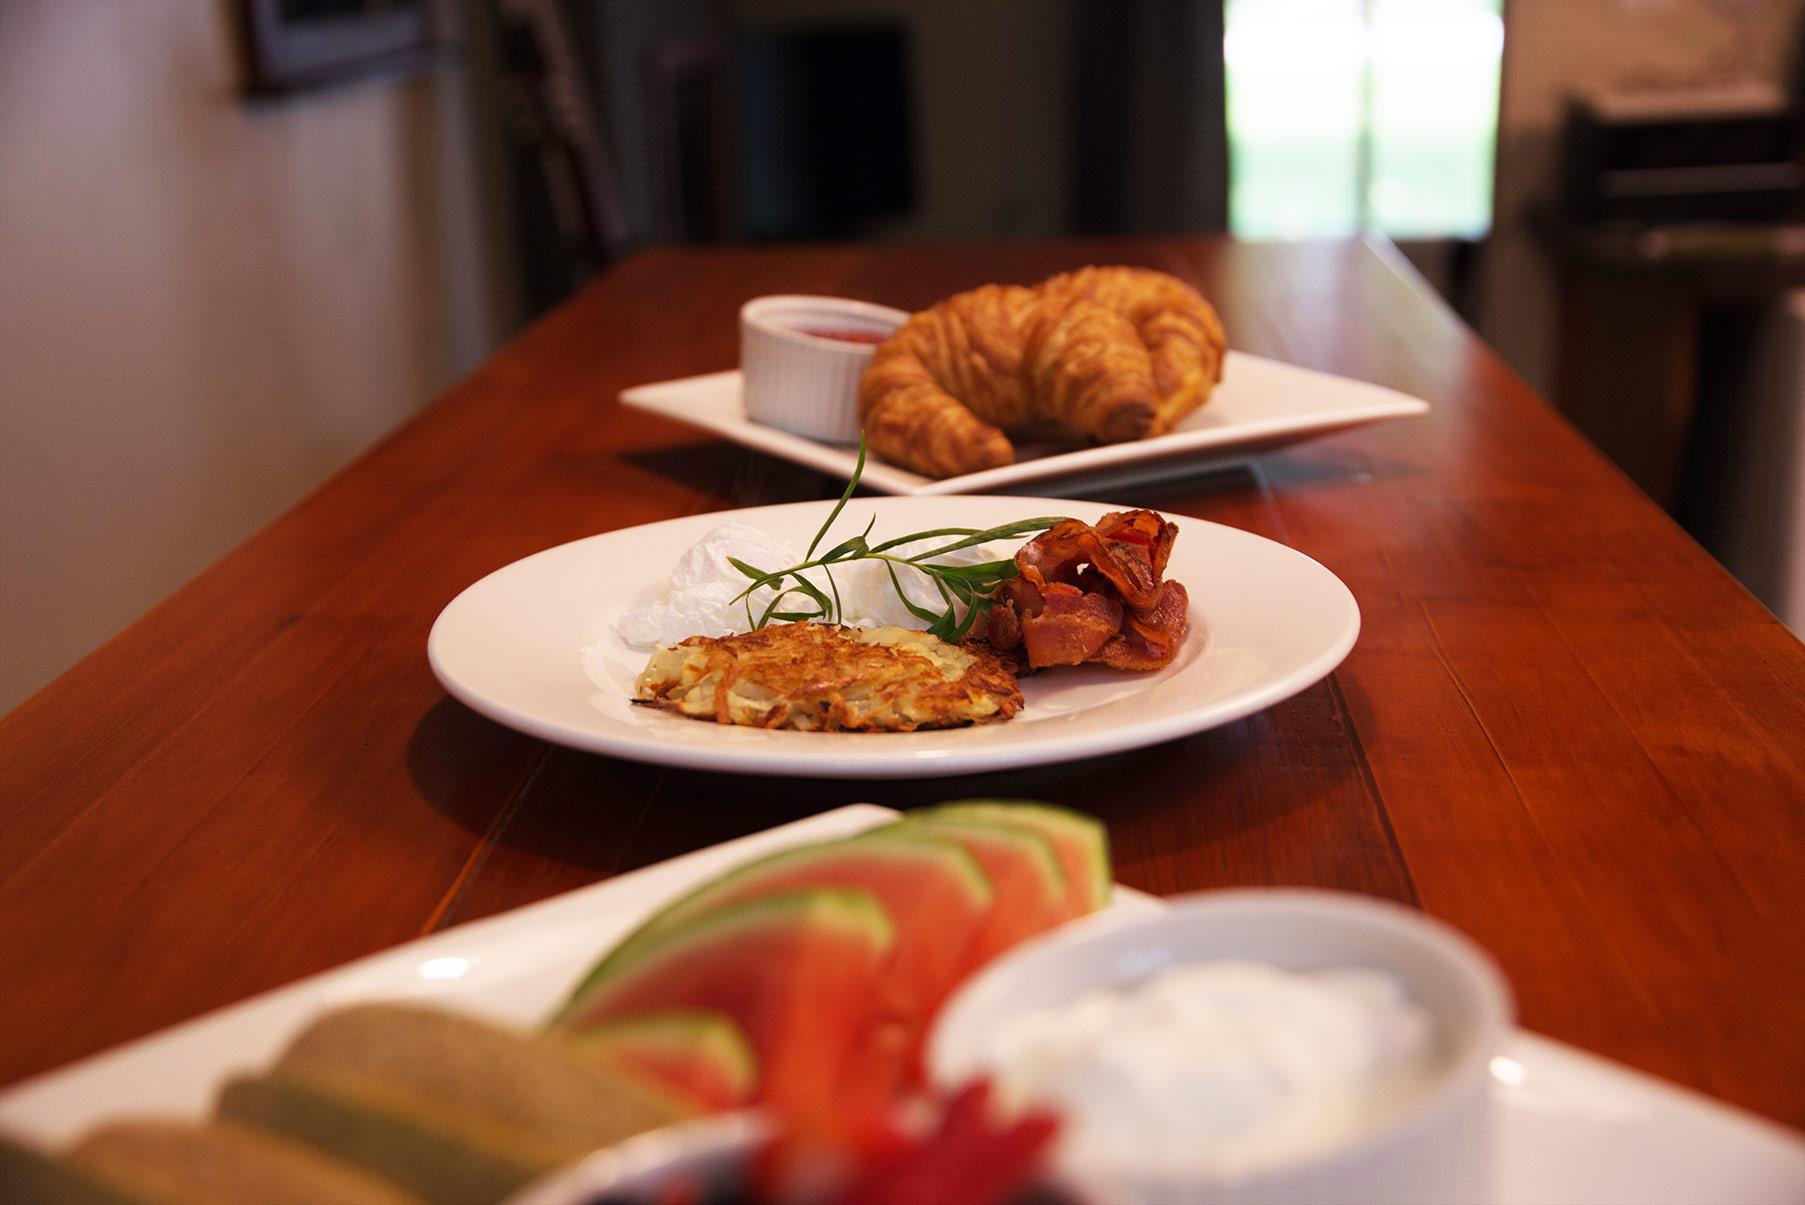 breakfast-served-for-you.jpg